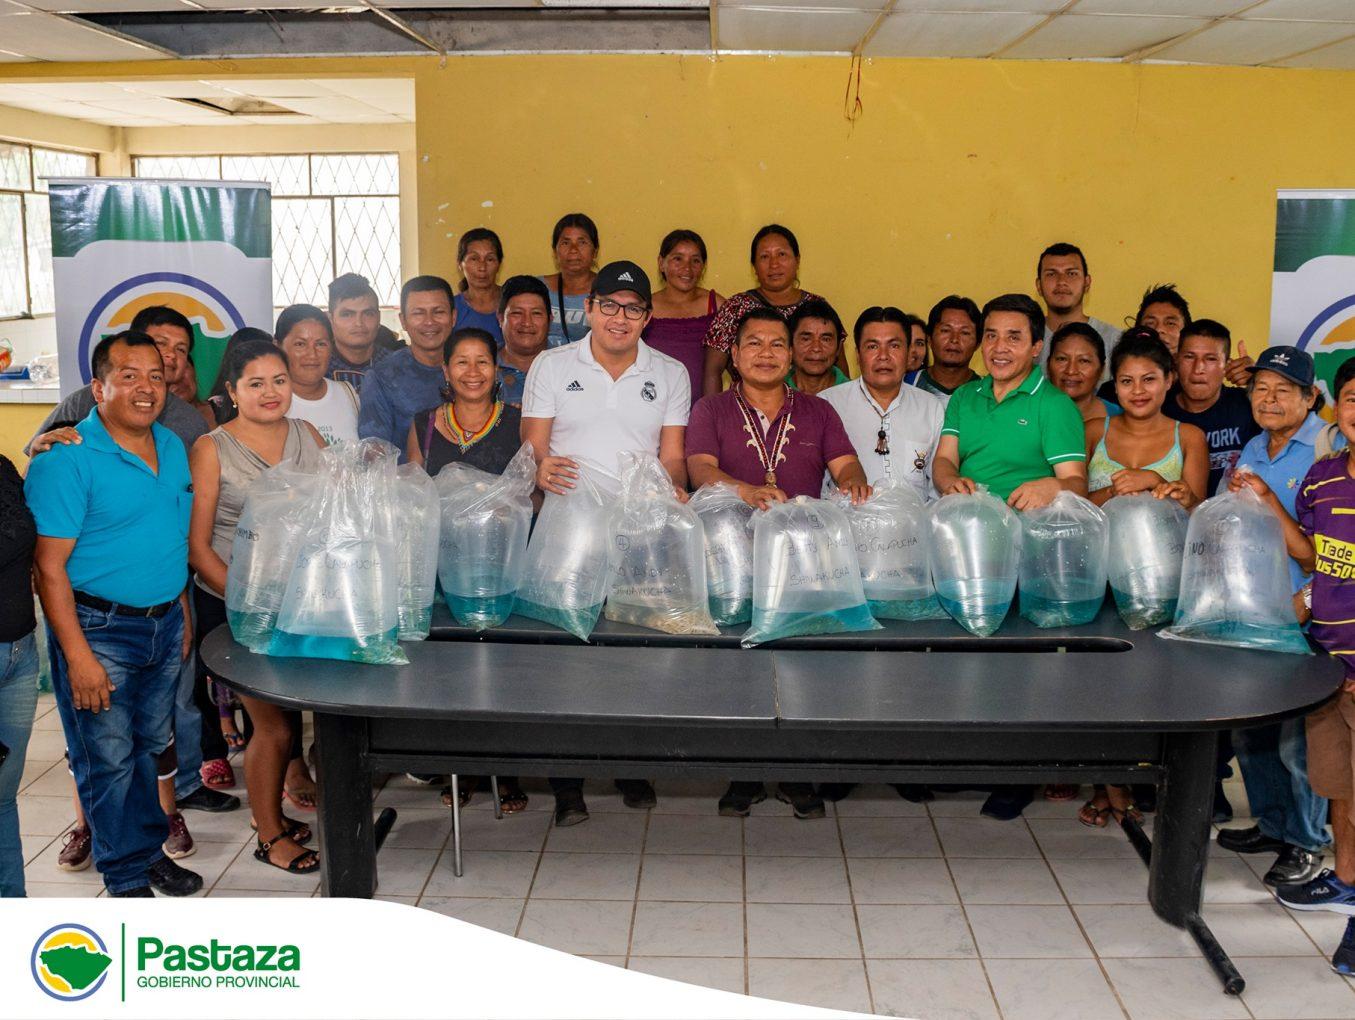 entrega de 35. 200 alevines de tilapia a diferentes comunidades del cantón Arajuno.